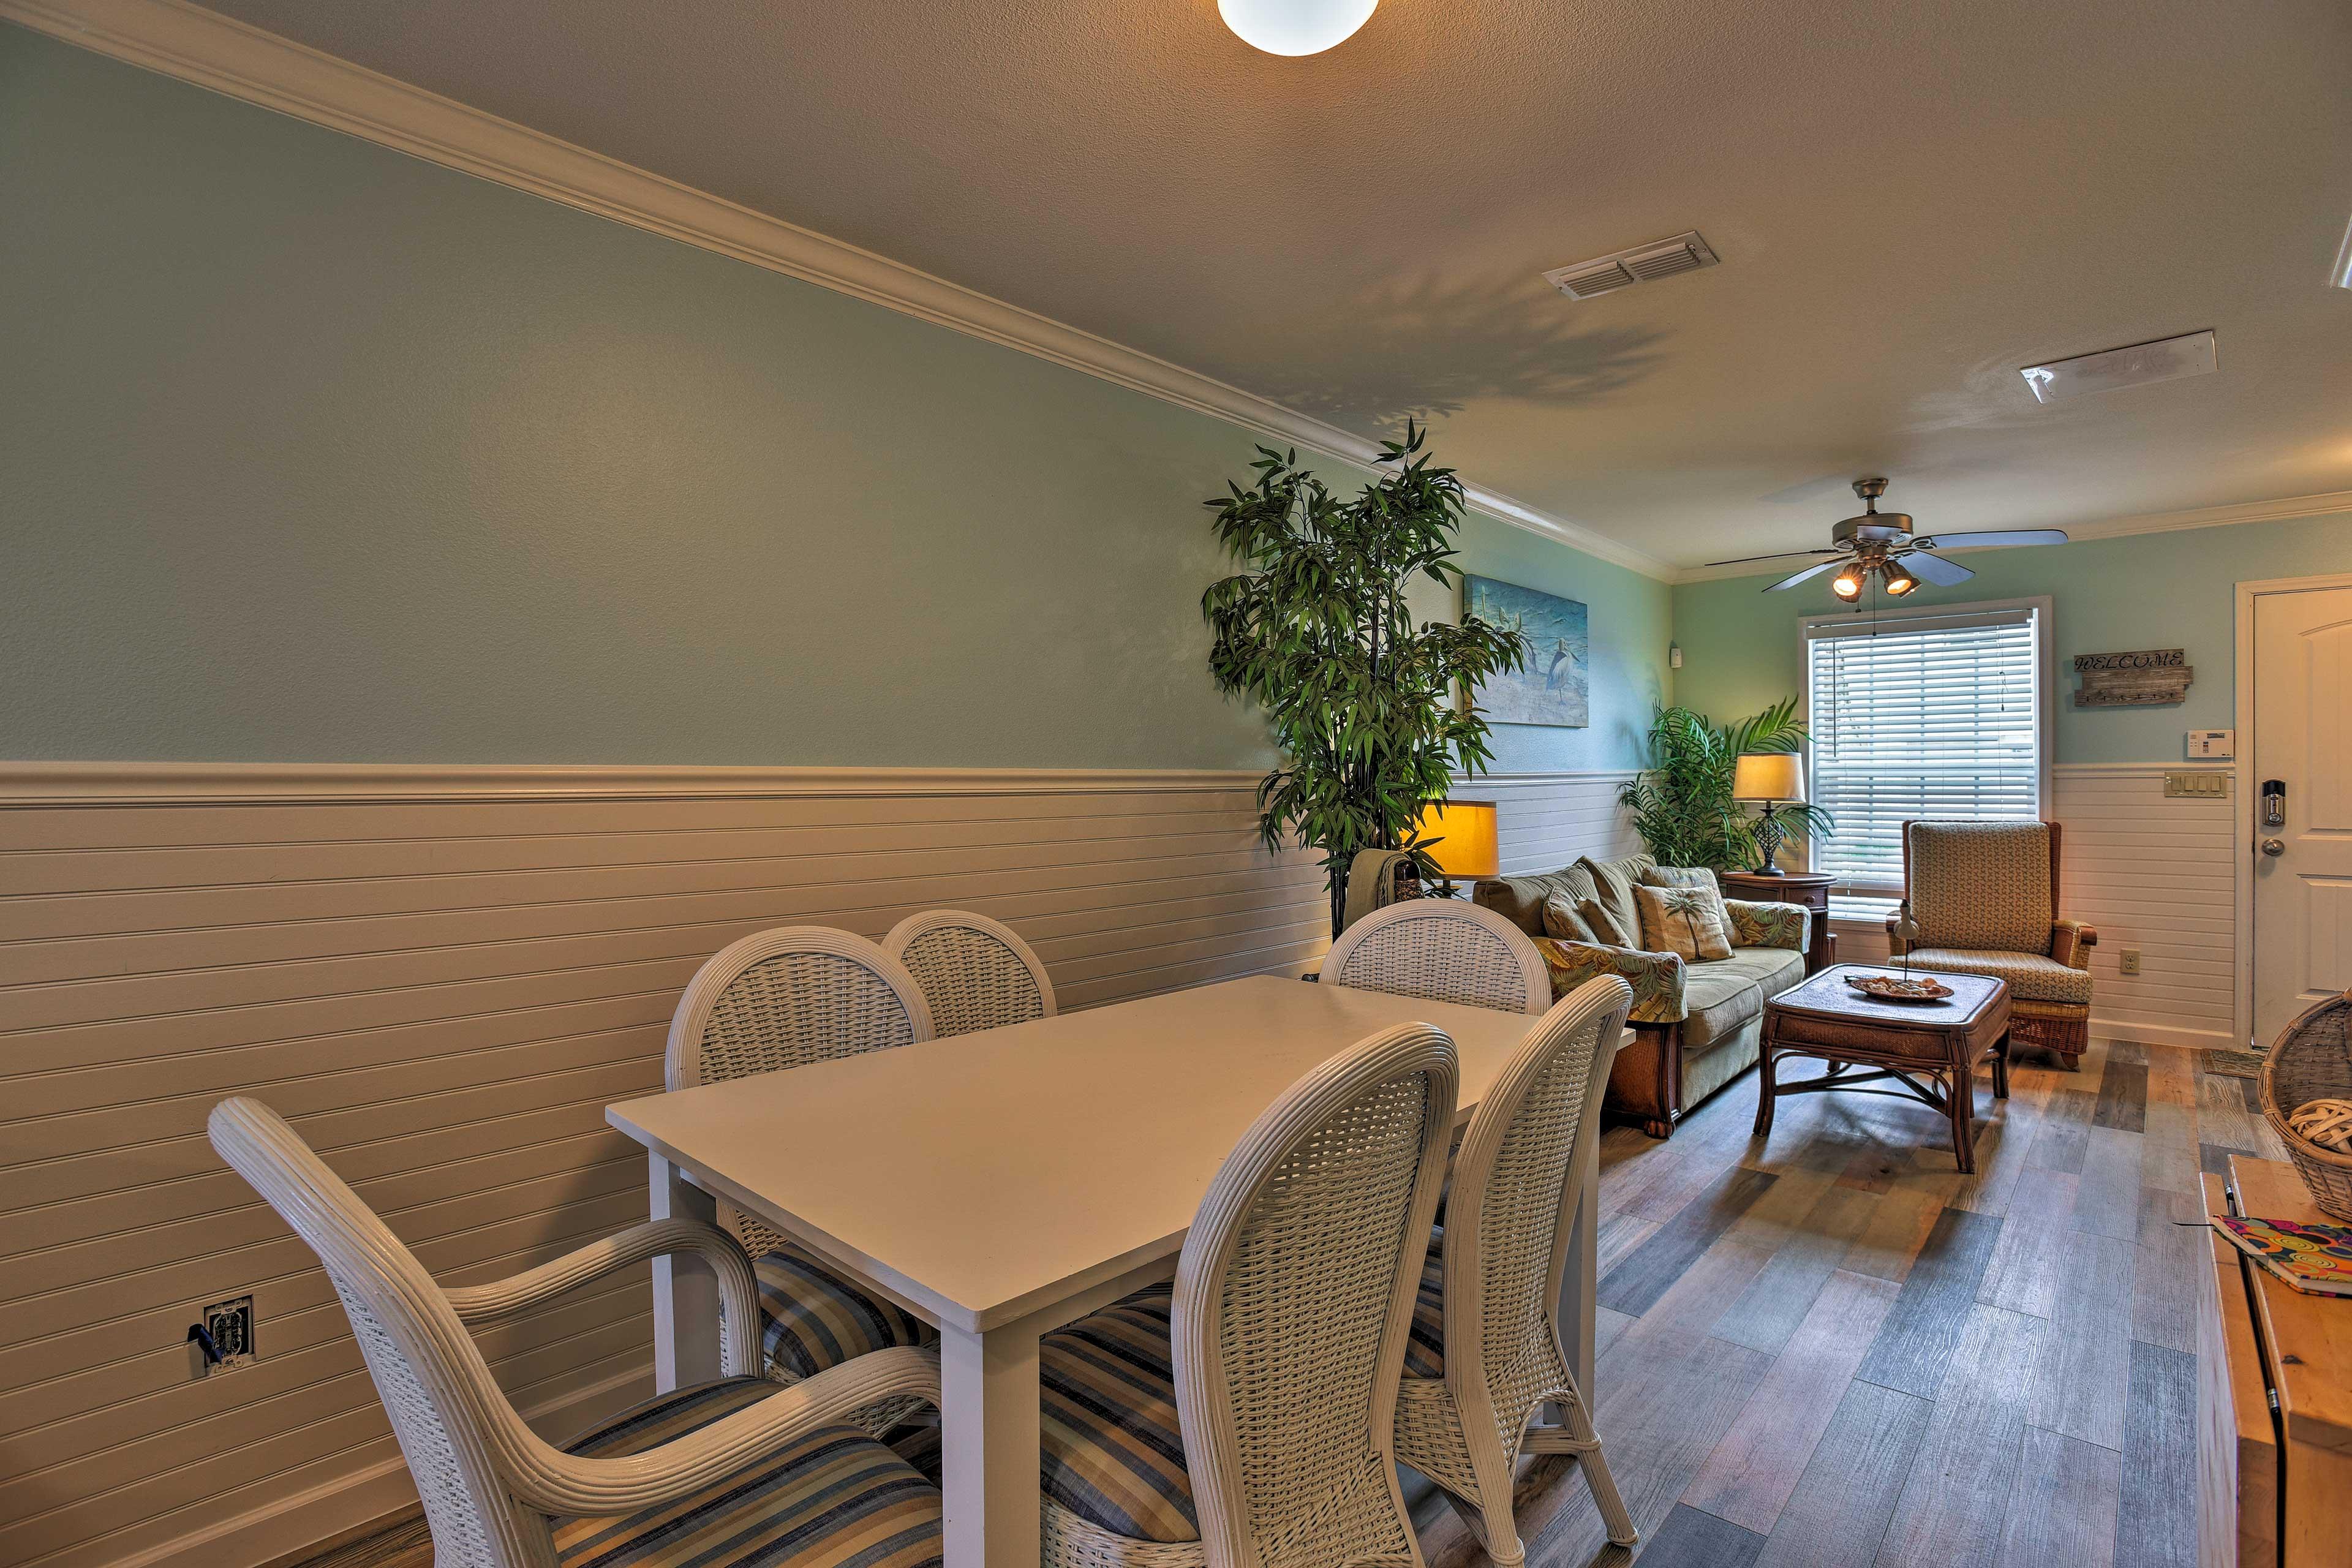 Bright blue walls and sleek hardwood floors highlight the living area.